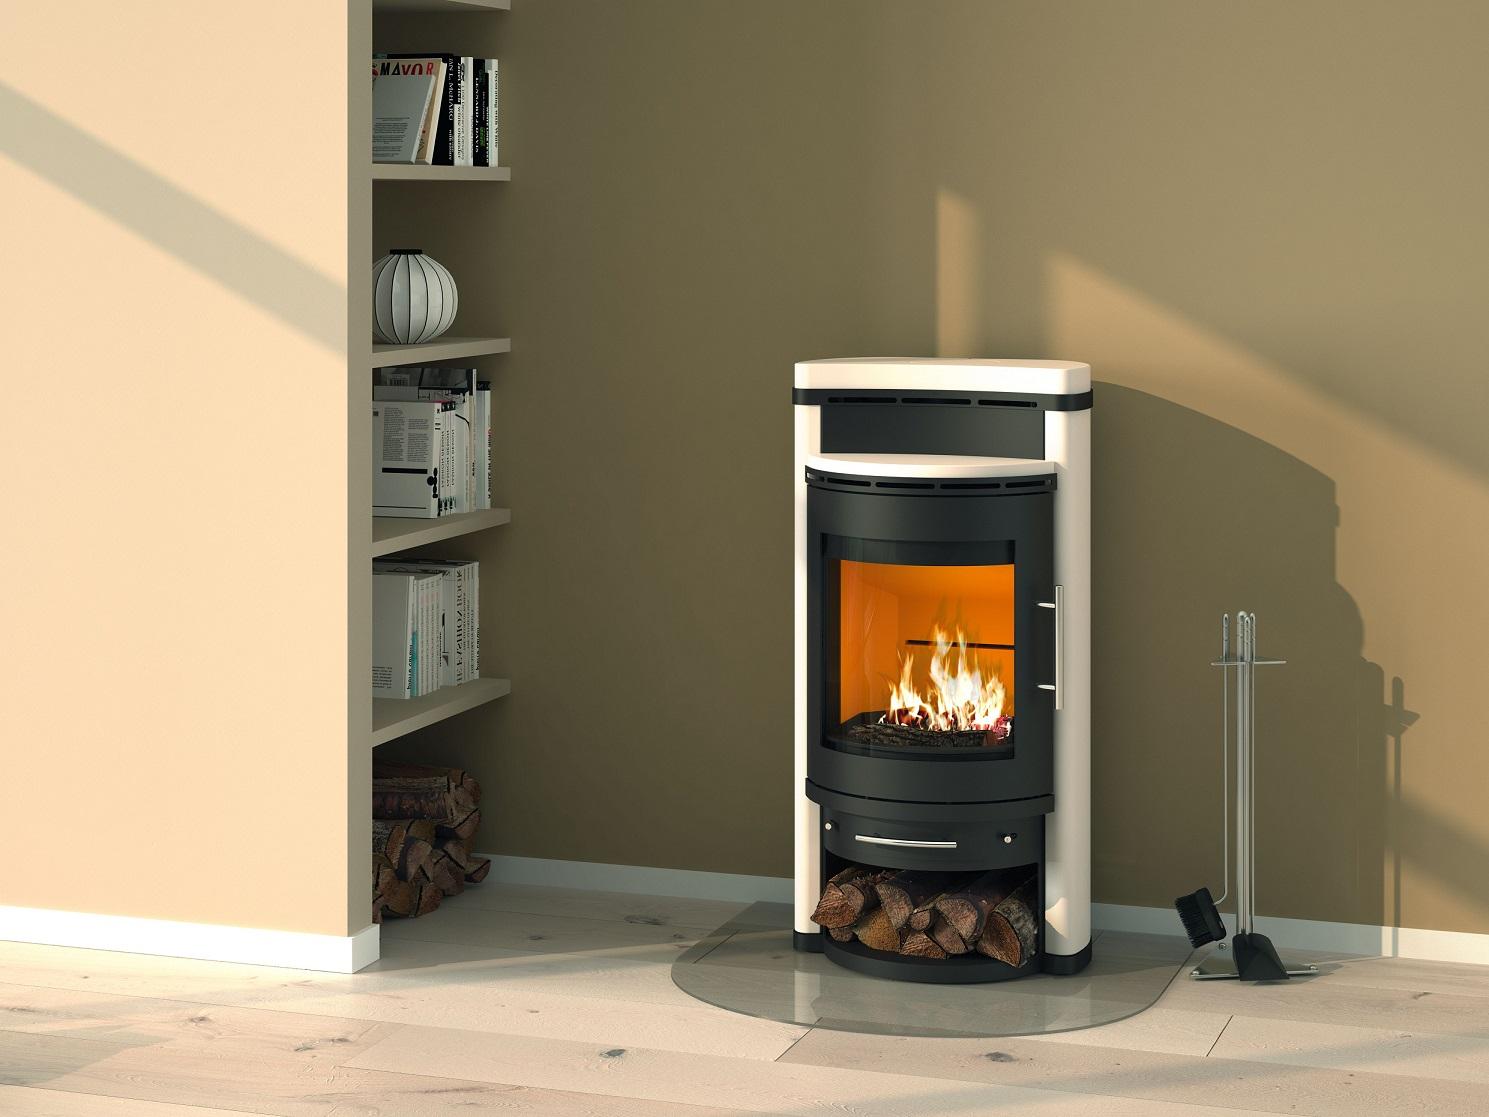 kaminofen k nigsh tte corvus keramik vanilla 6kw. Black Bedroom Furniture Sets. Home Design Ideas